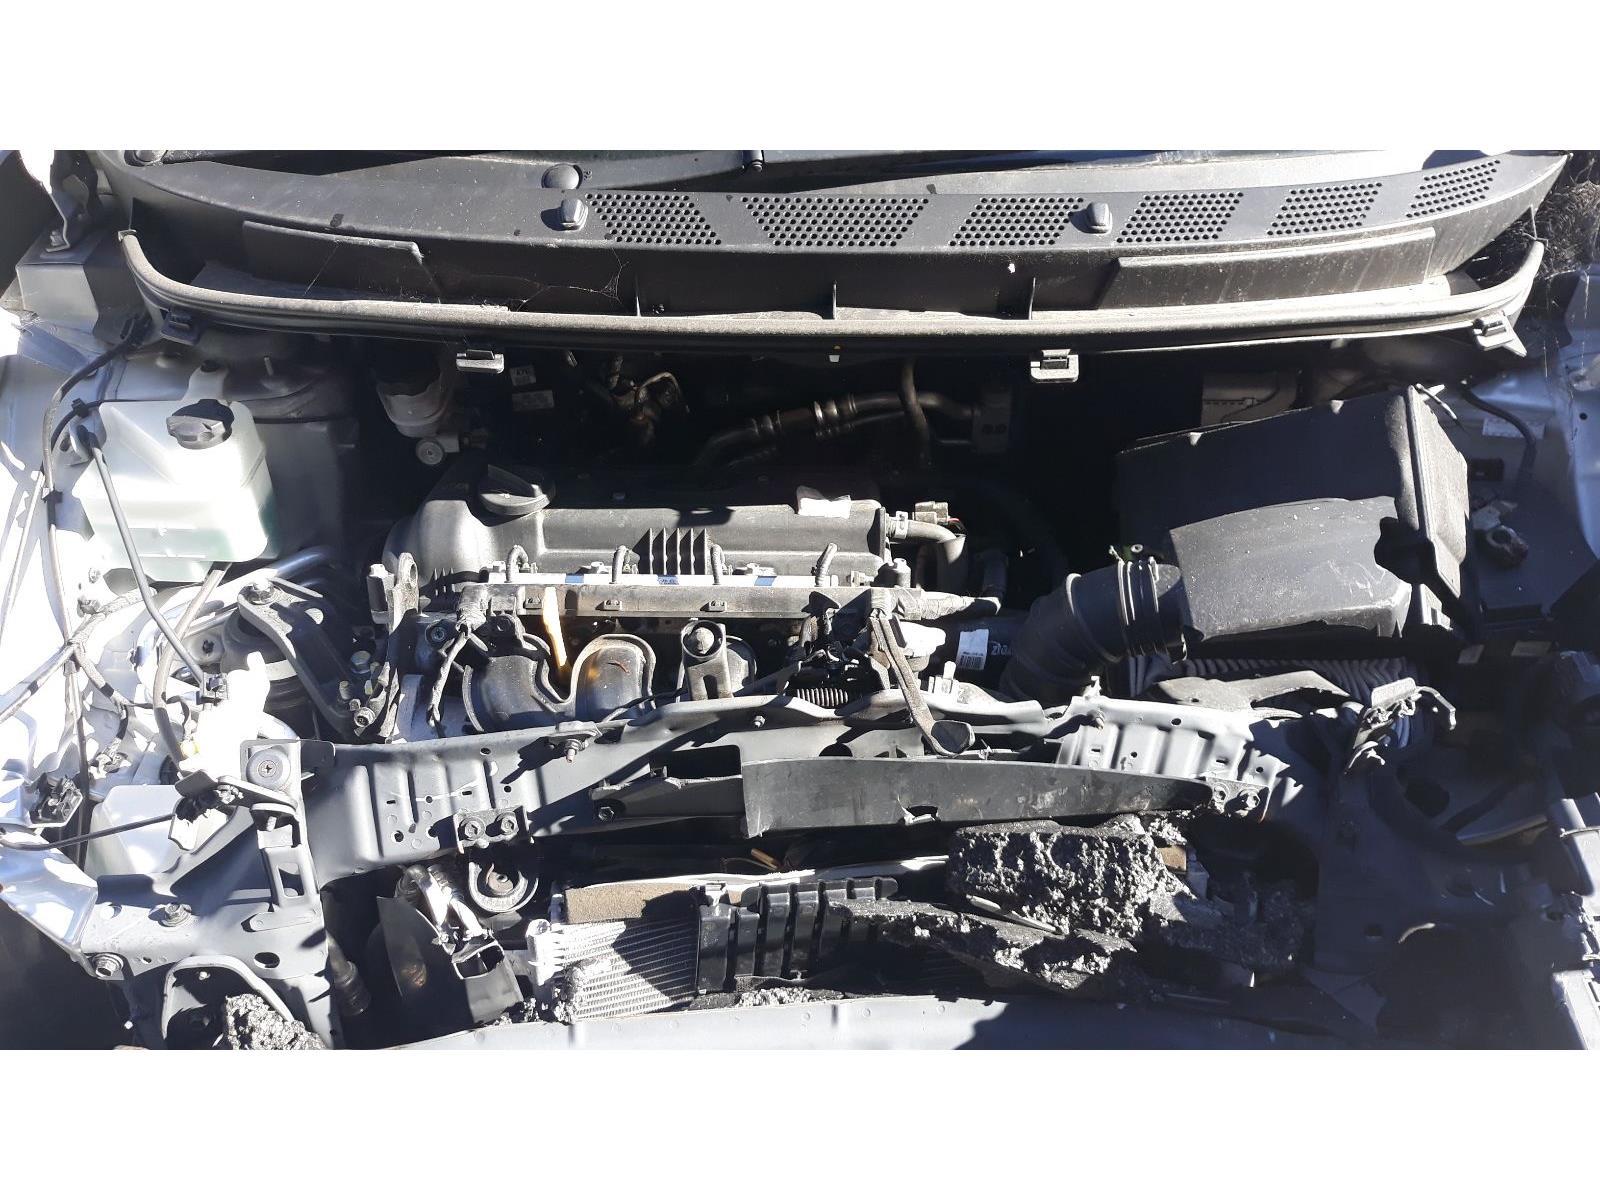 Hyundai Ix20 2015 On Se Blue Drive 5 Door Hatchback Scrap Peugeot 106 Zest 2 Fuse Box Year